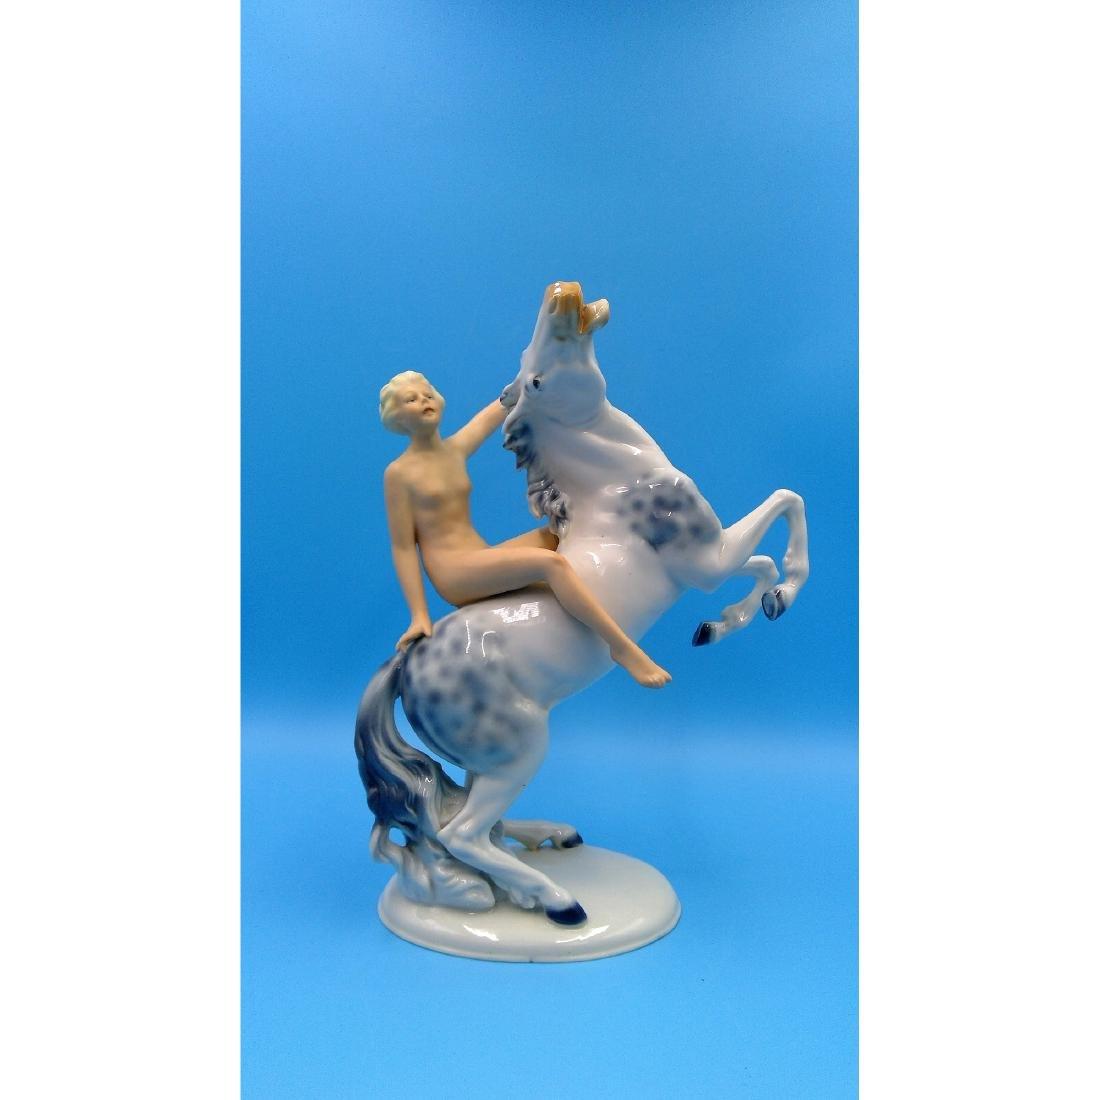 WALLENDORF GERMAN PORCELAIN NUDE ON HORSE FIGURE